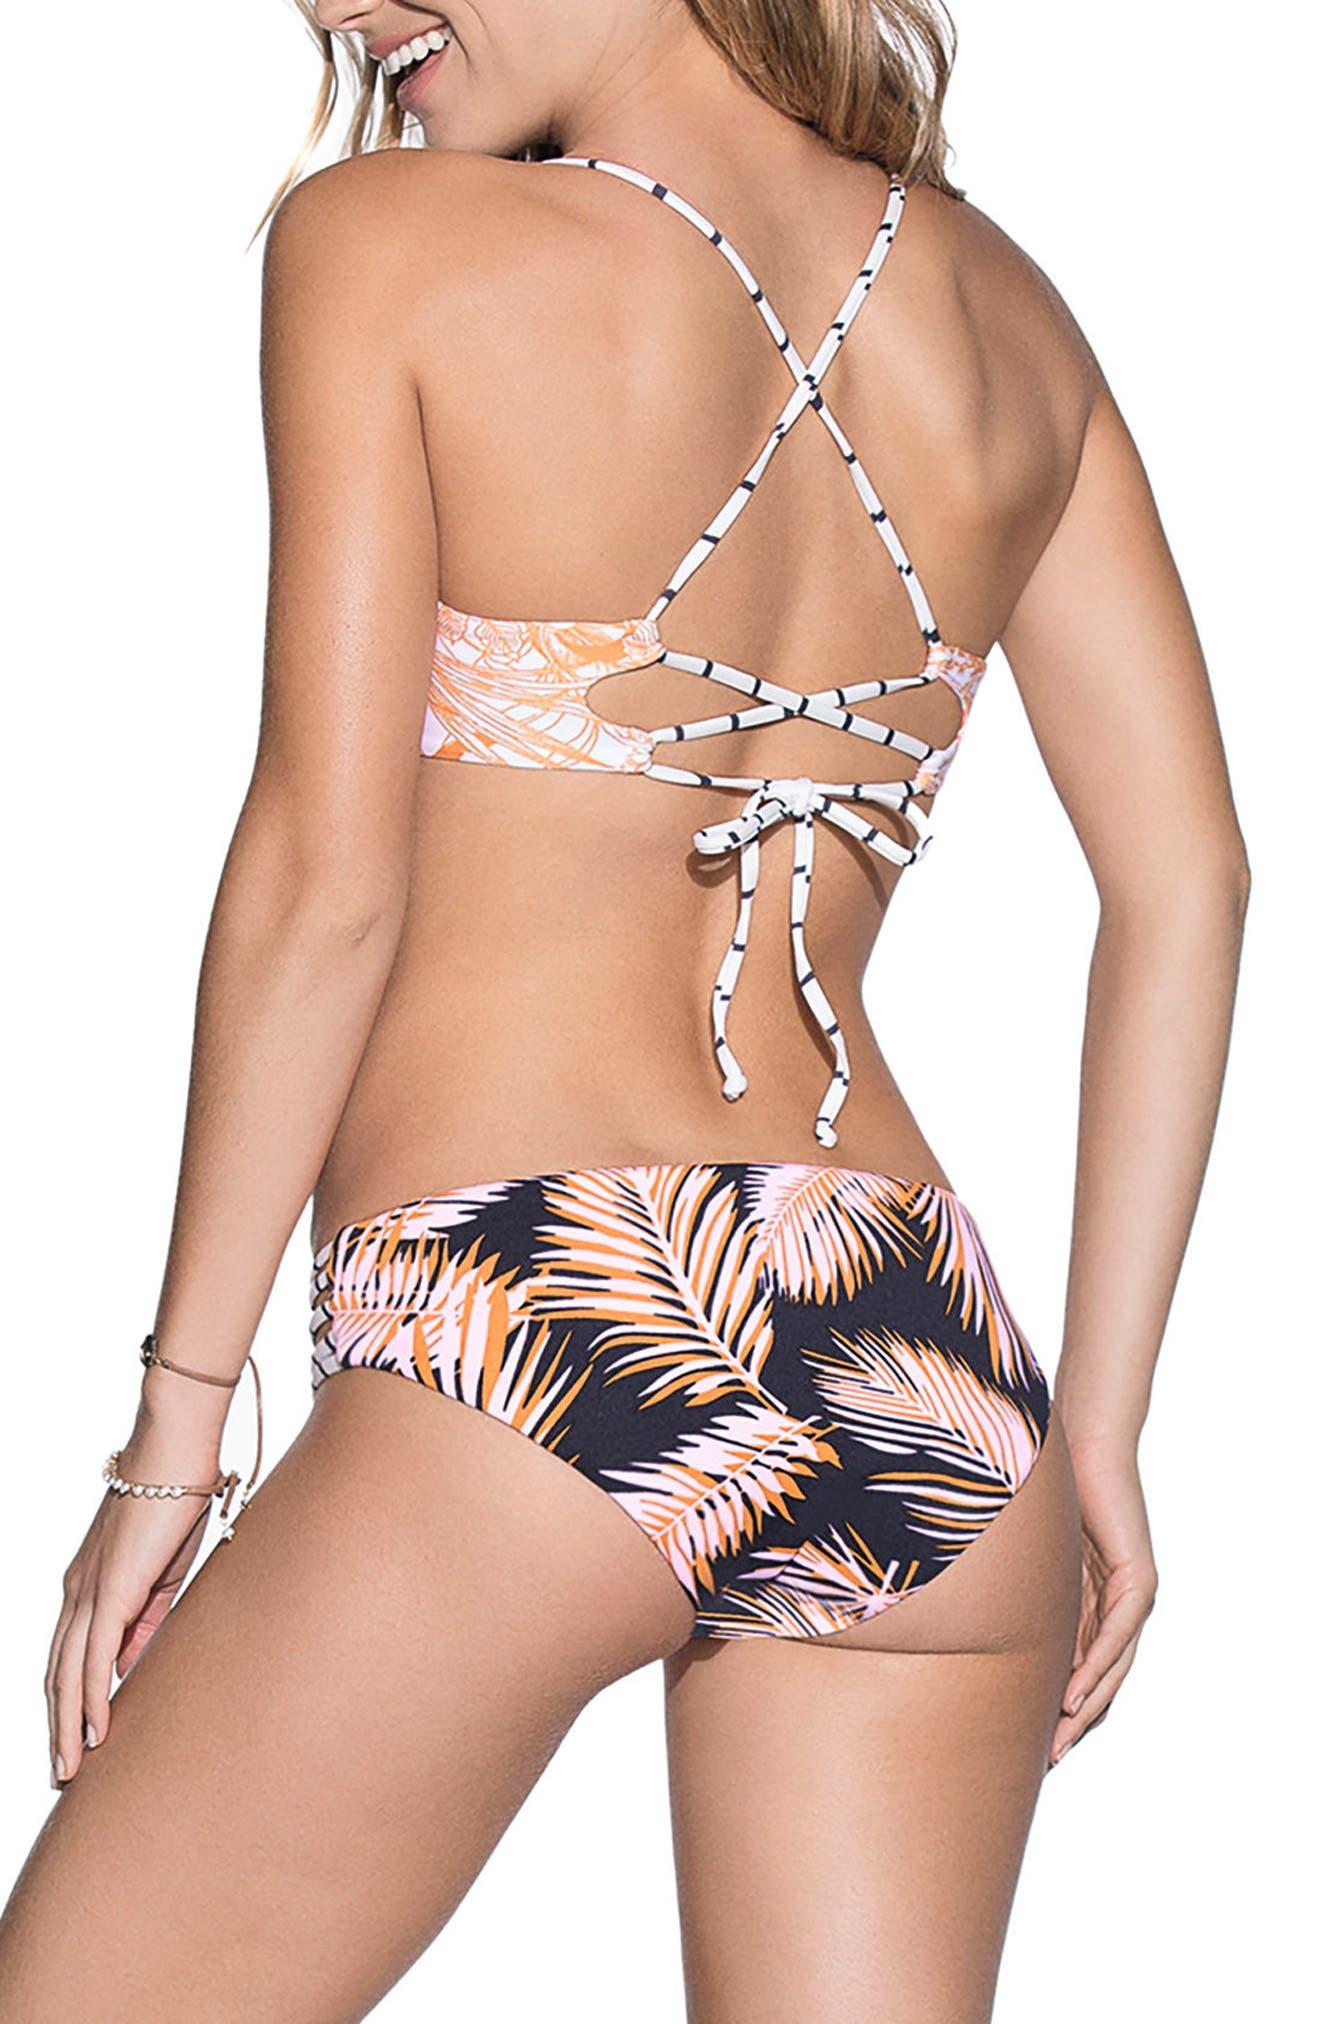 Caribbean Curuba Underwire Bikini Top,                             Alternate thumbnail 4, color,                             950